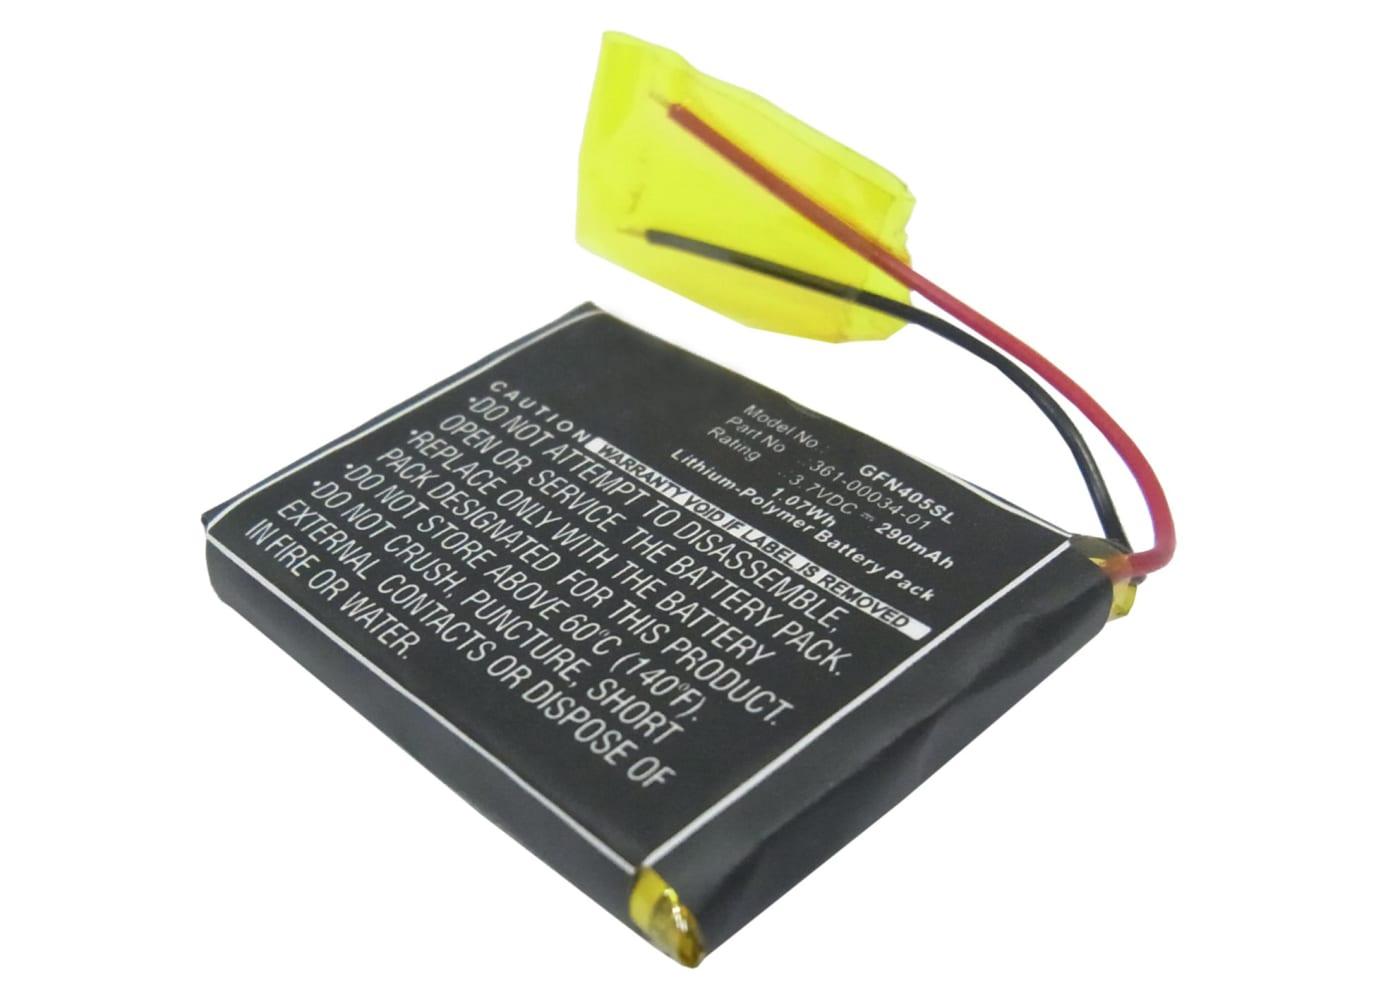 GPS Ersatz Akku für Garmin Foretrex 401 Foretrex 405 Foretrex 405cx Navigationsgerät - 361-00034-01 290mAh Navi Ersatzakku , Batterie